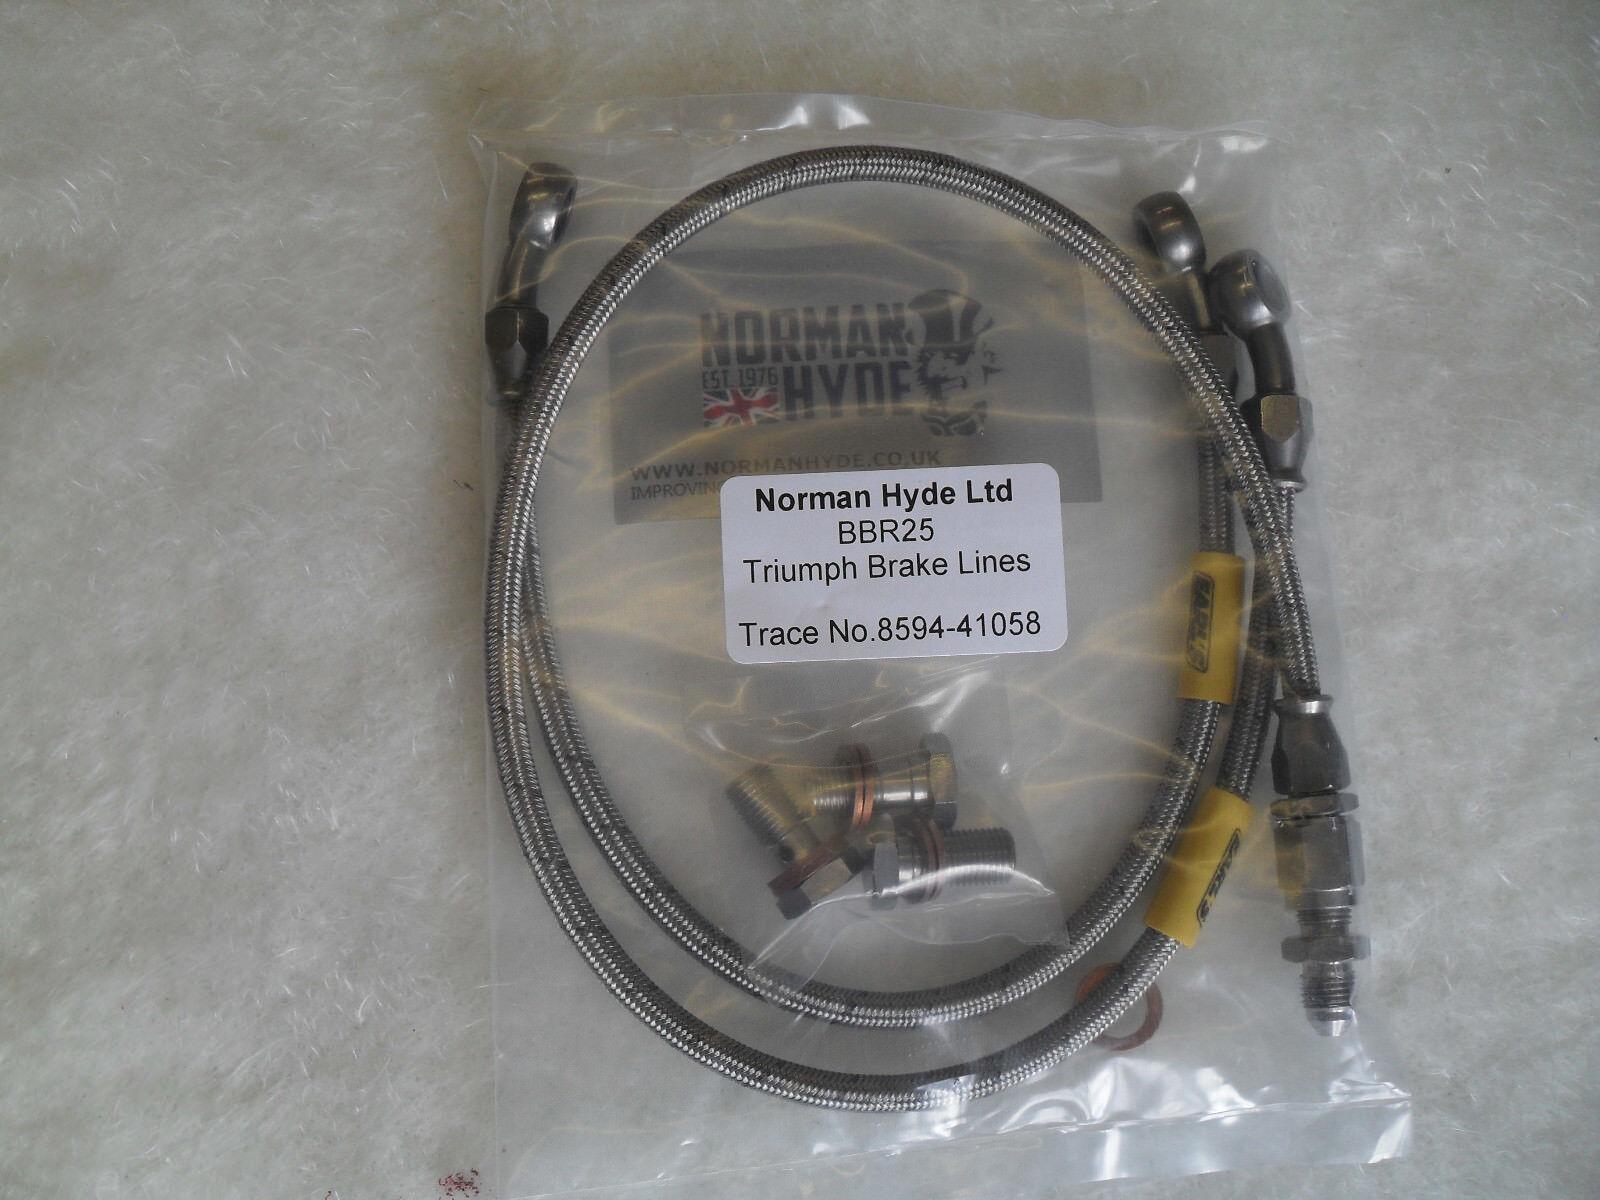 STAINLESS REAR BRAKE HOSE KIT REAR CAL NORMAN HYDE AT BOTTOM T140 T150 T160